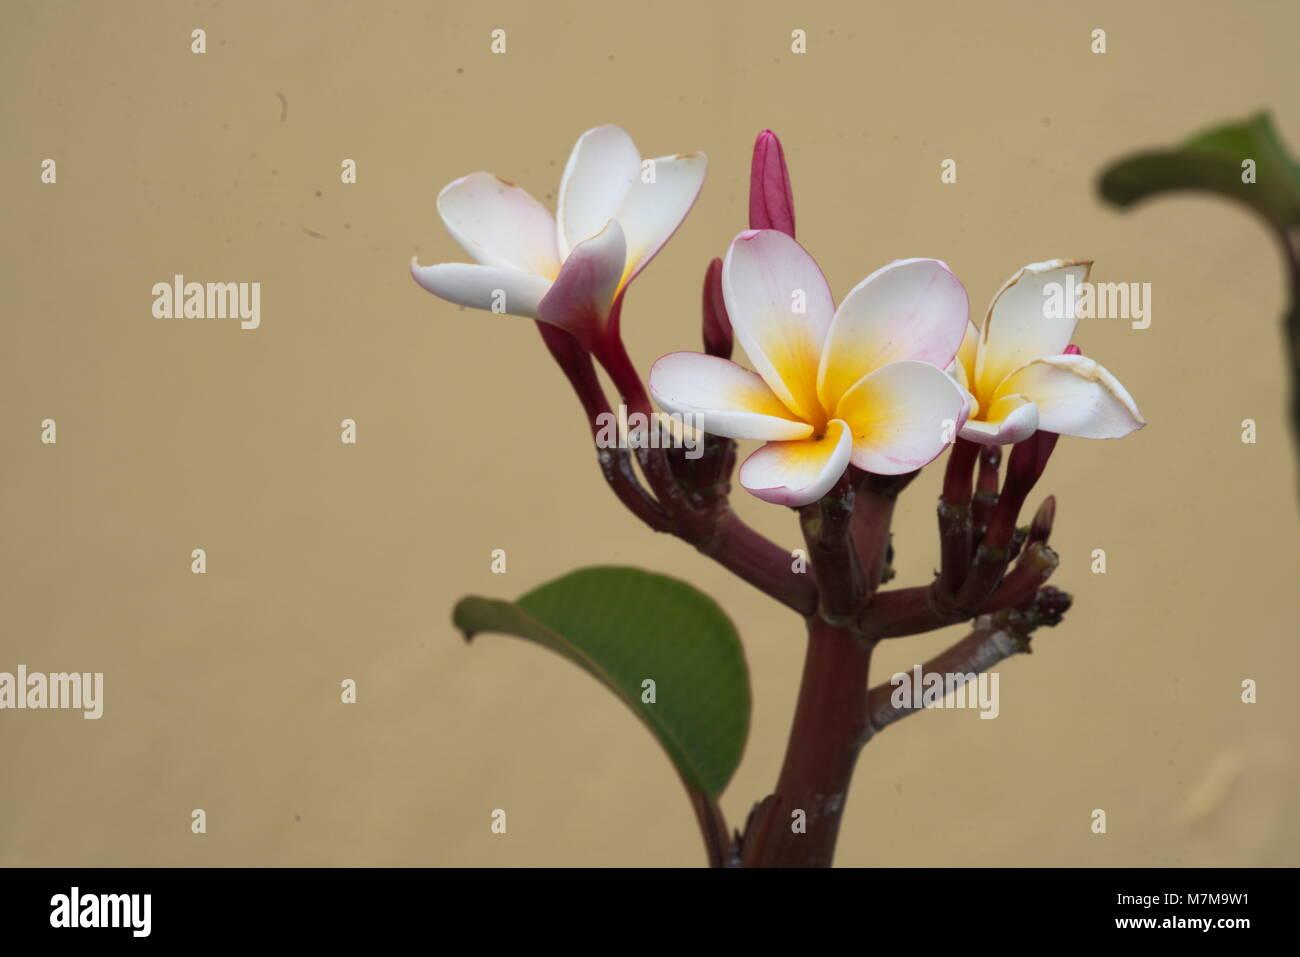 white-yellow blooms of a plumeria - Stock Image